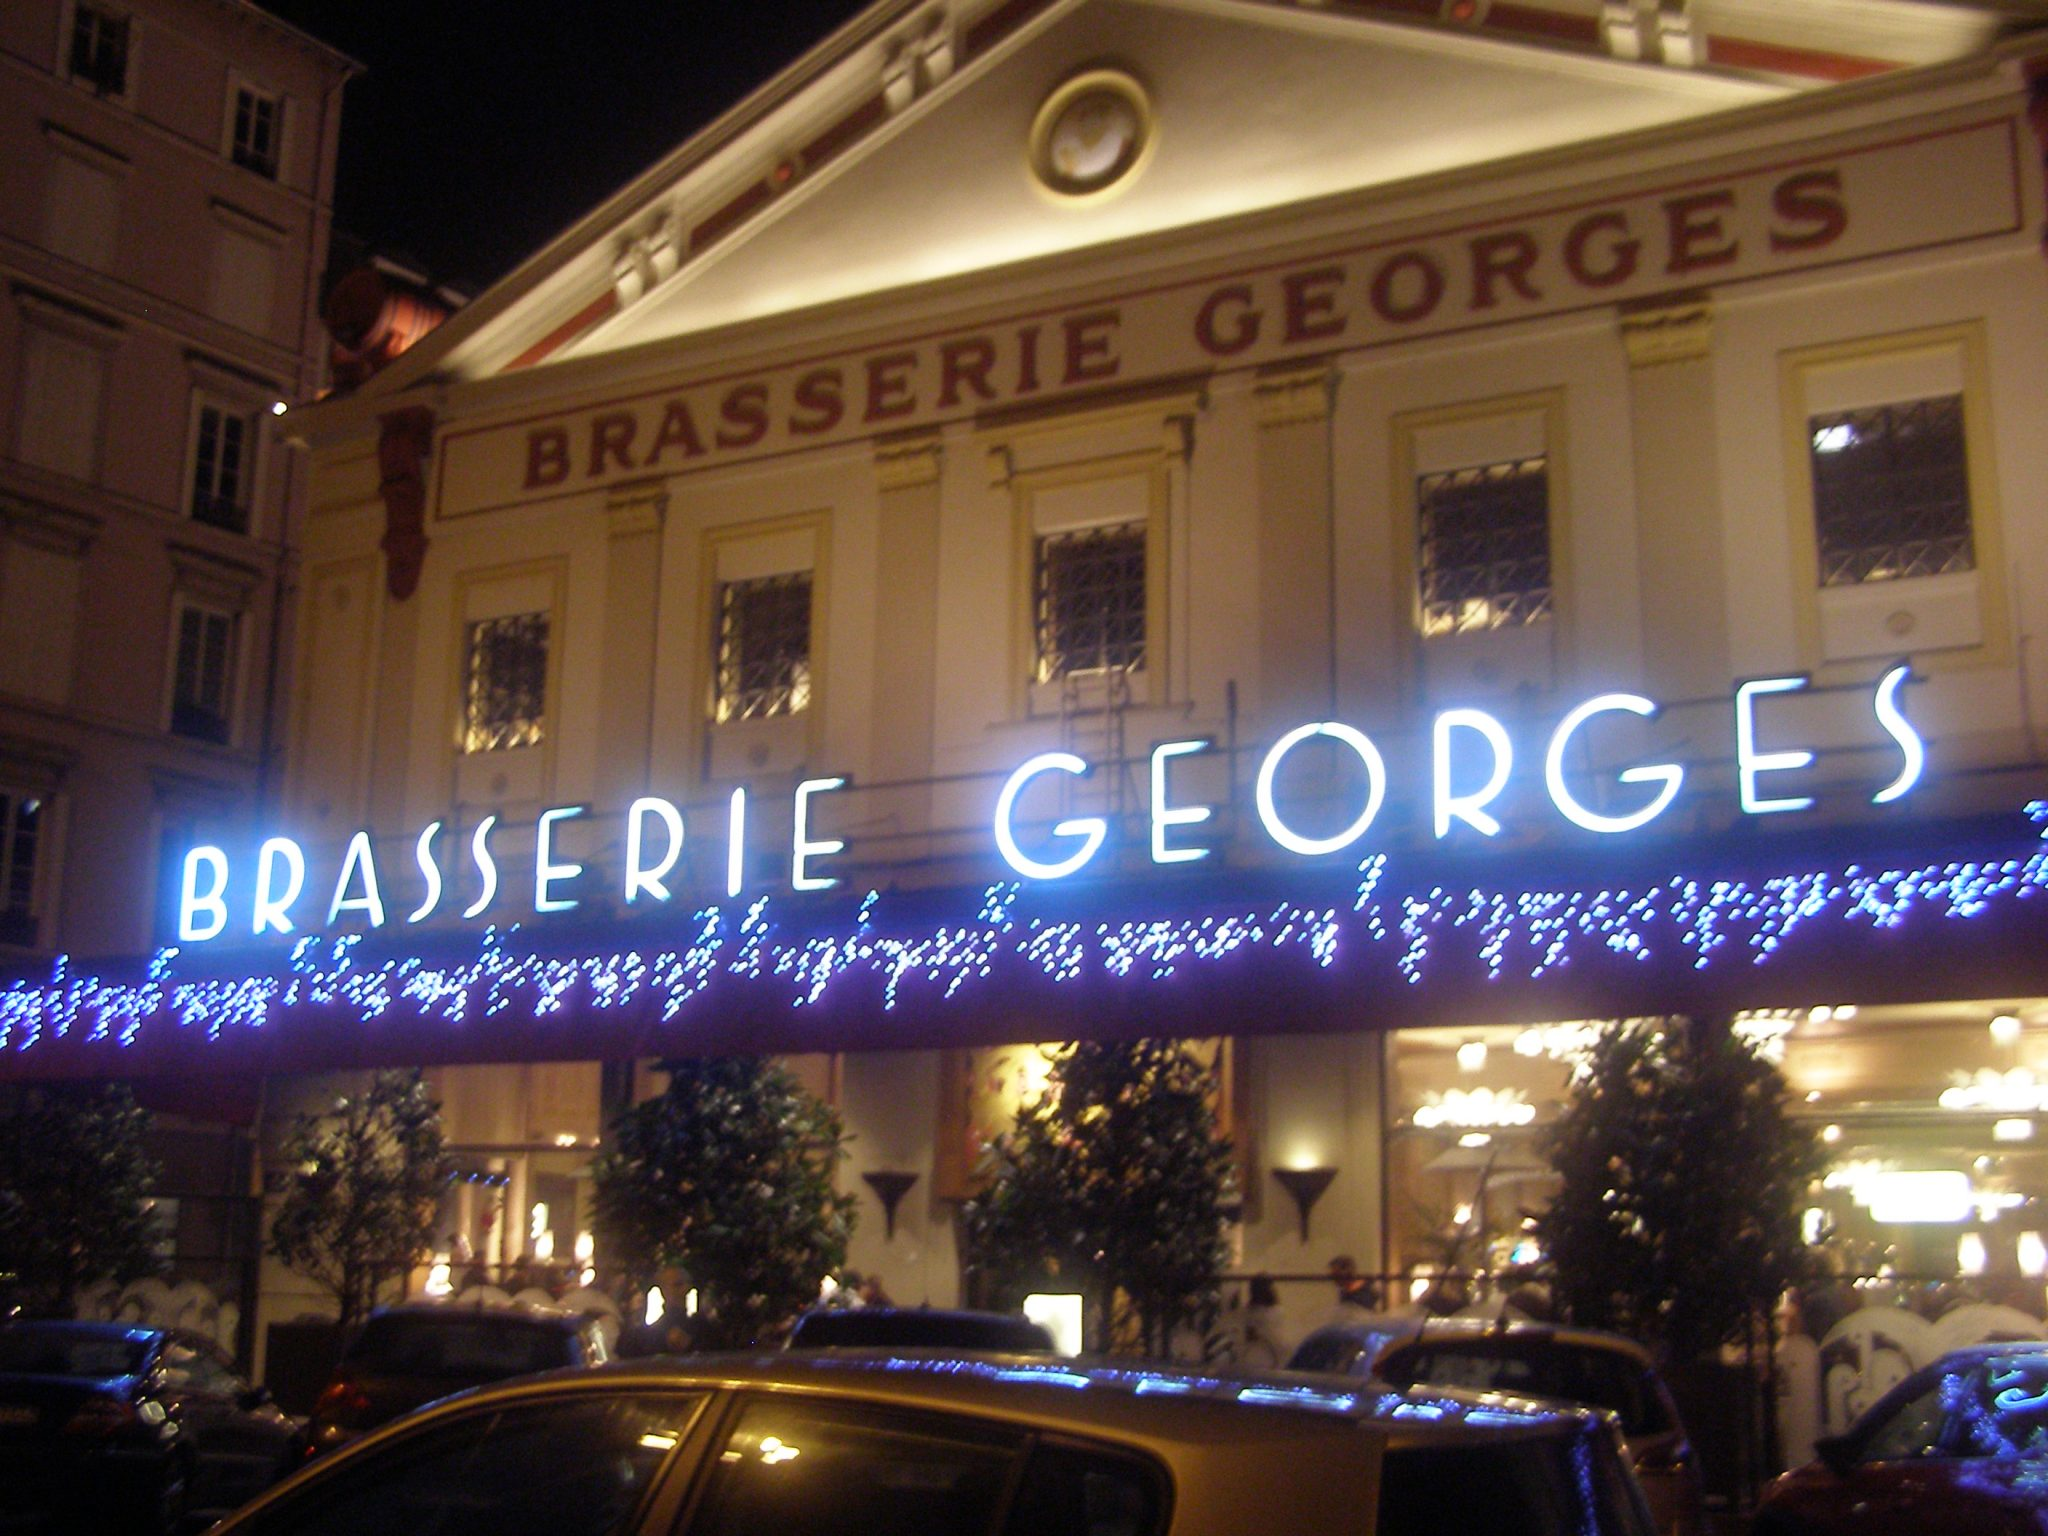 Brasserie George, Lyon, France